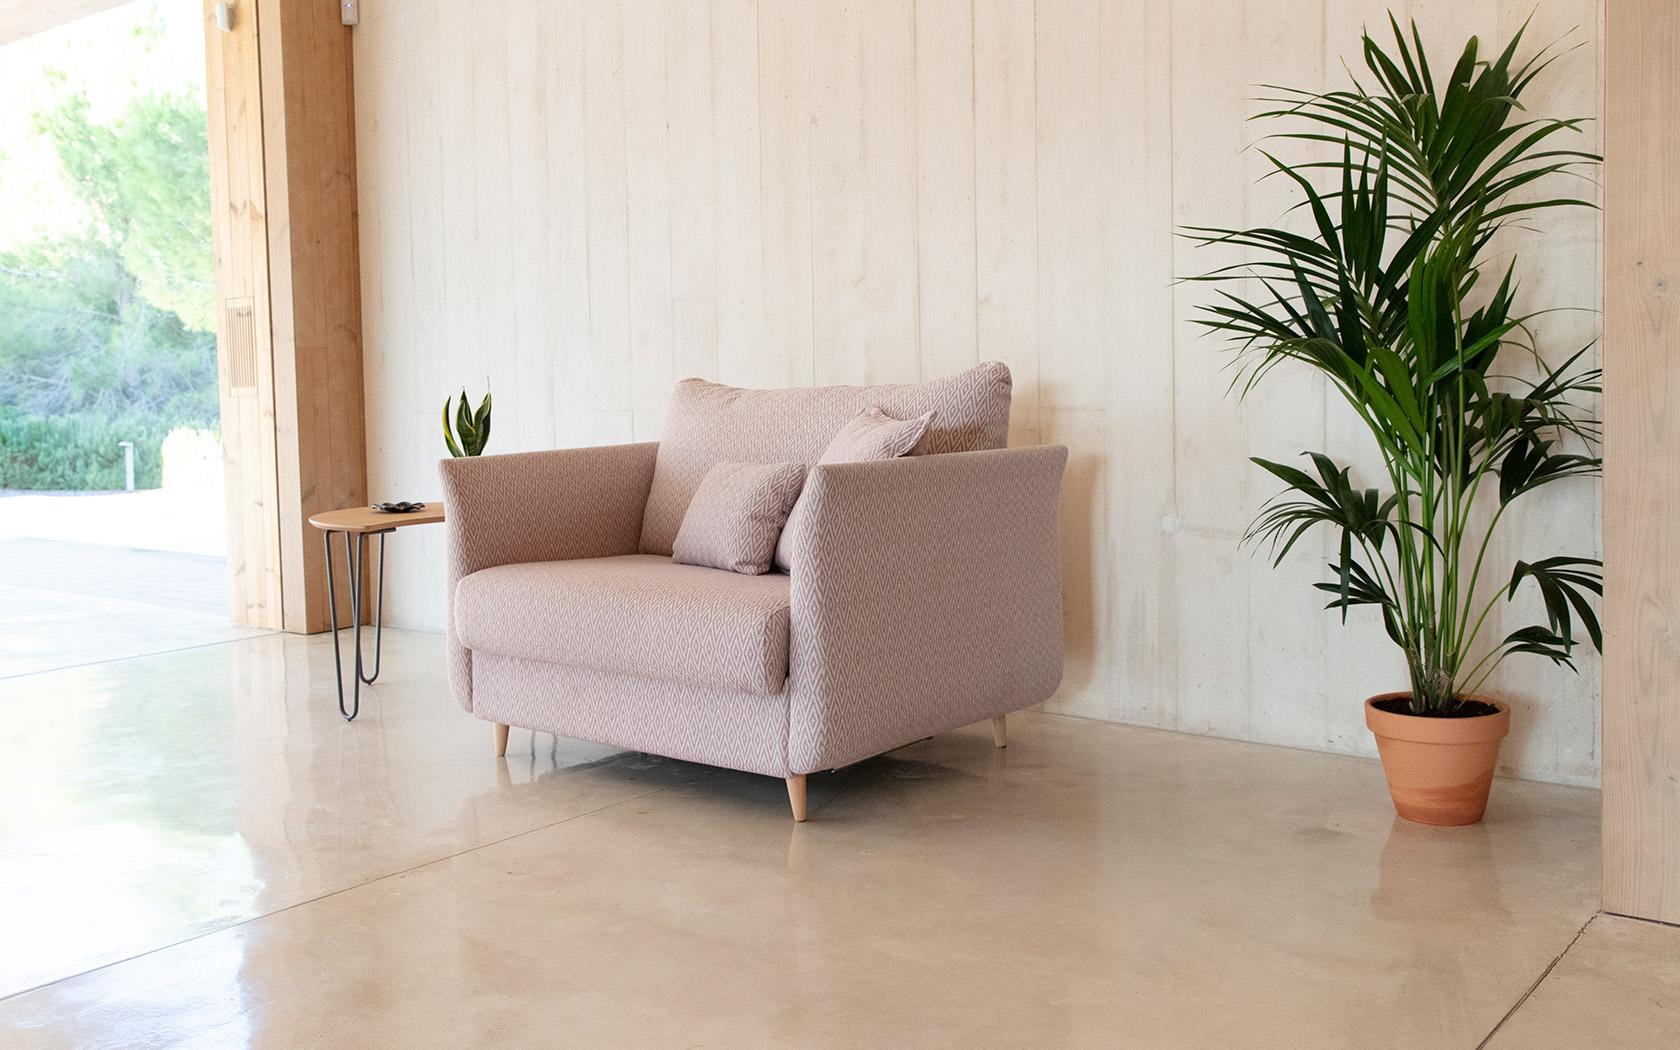 Helsinki sofa cama 2021 baja 04